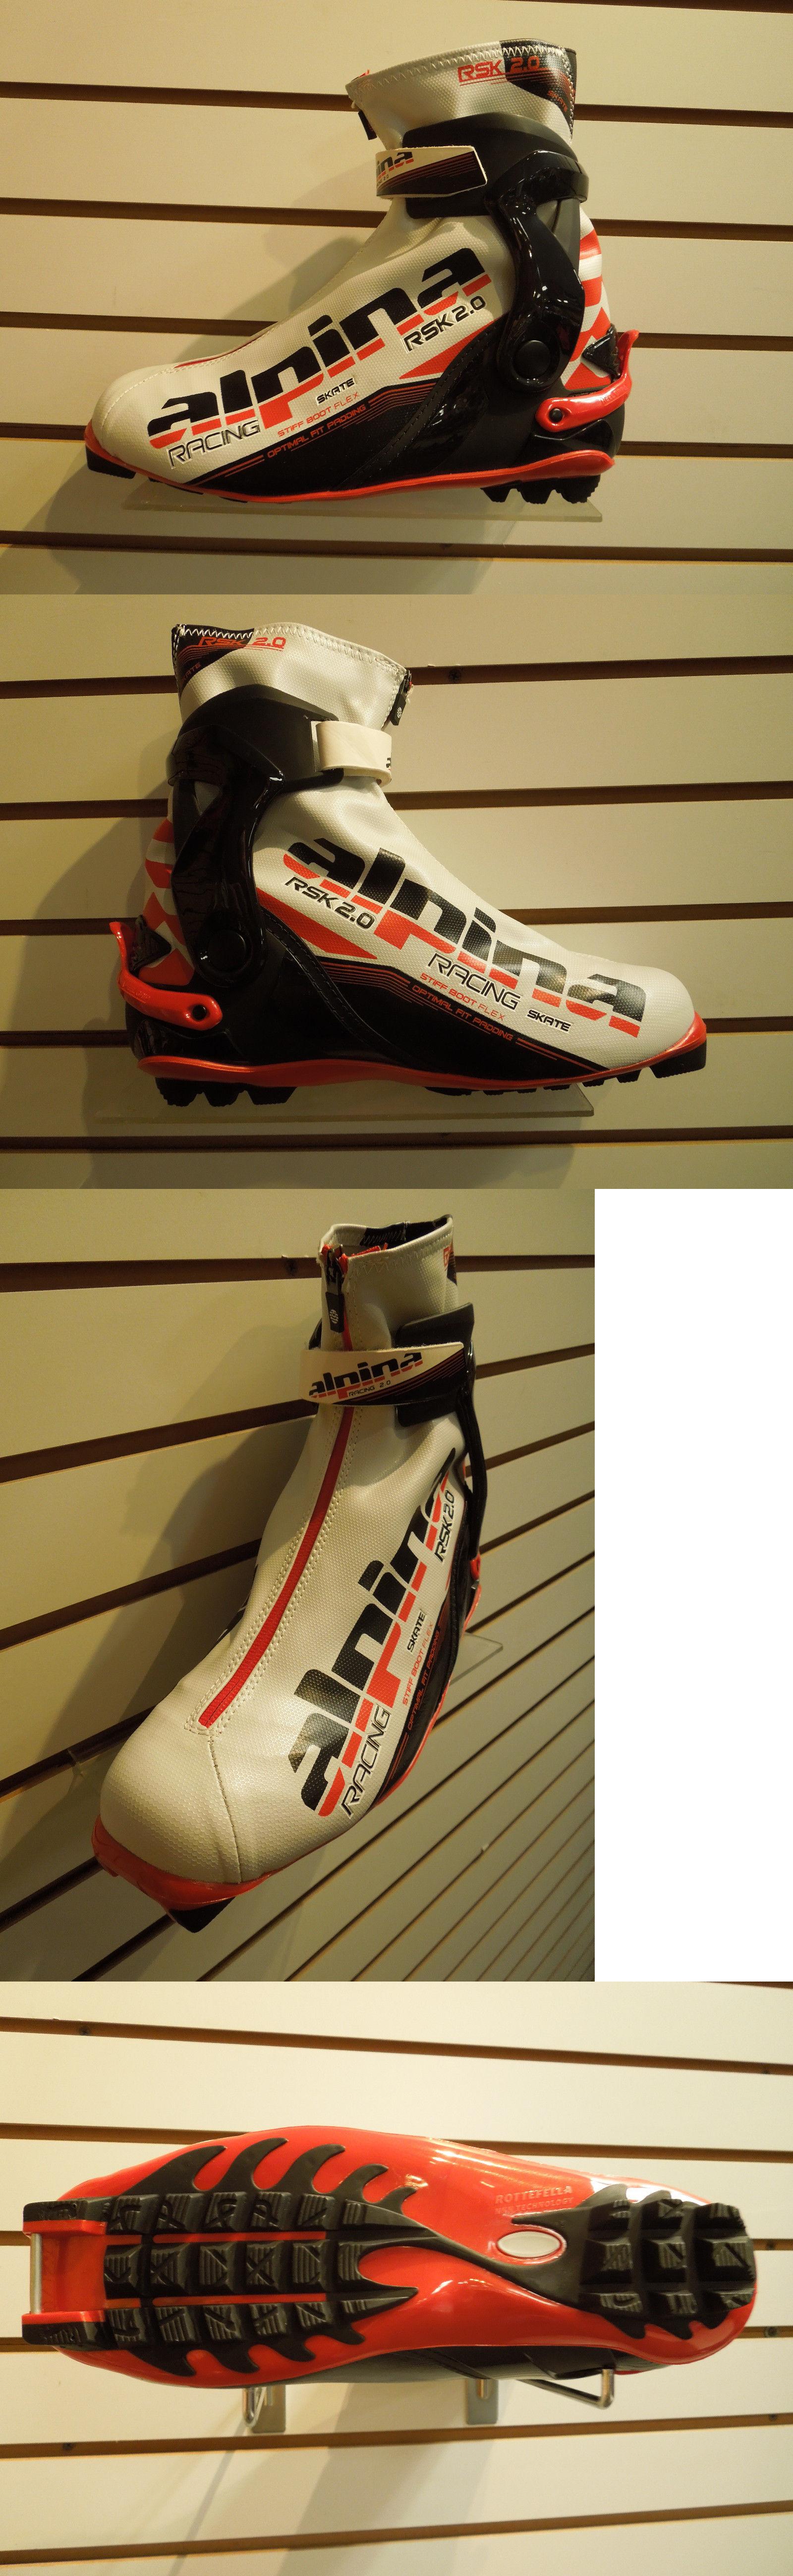 Boots Alpina Rsk Cross Country Ski Boots Size Skate - Alpina skate ski boots